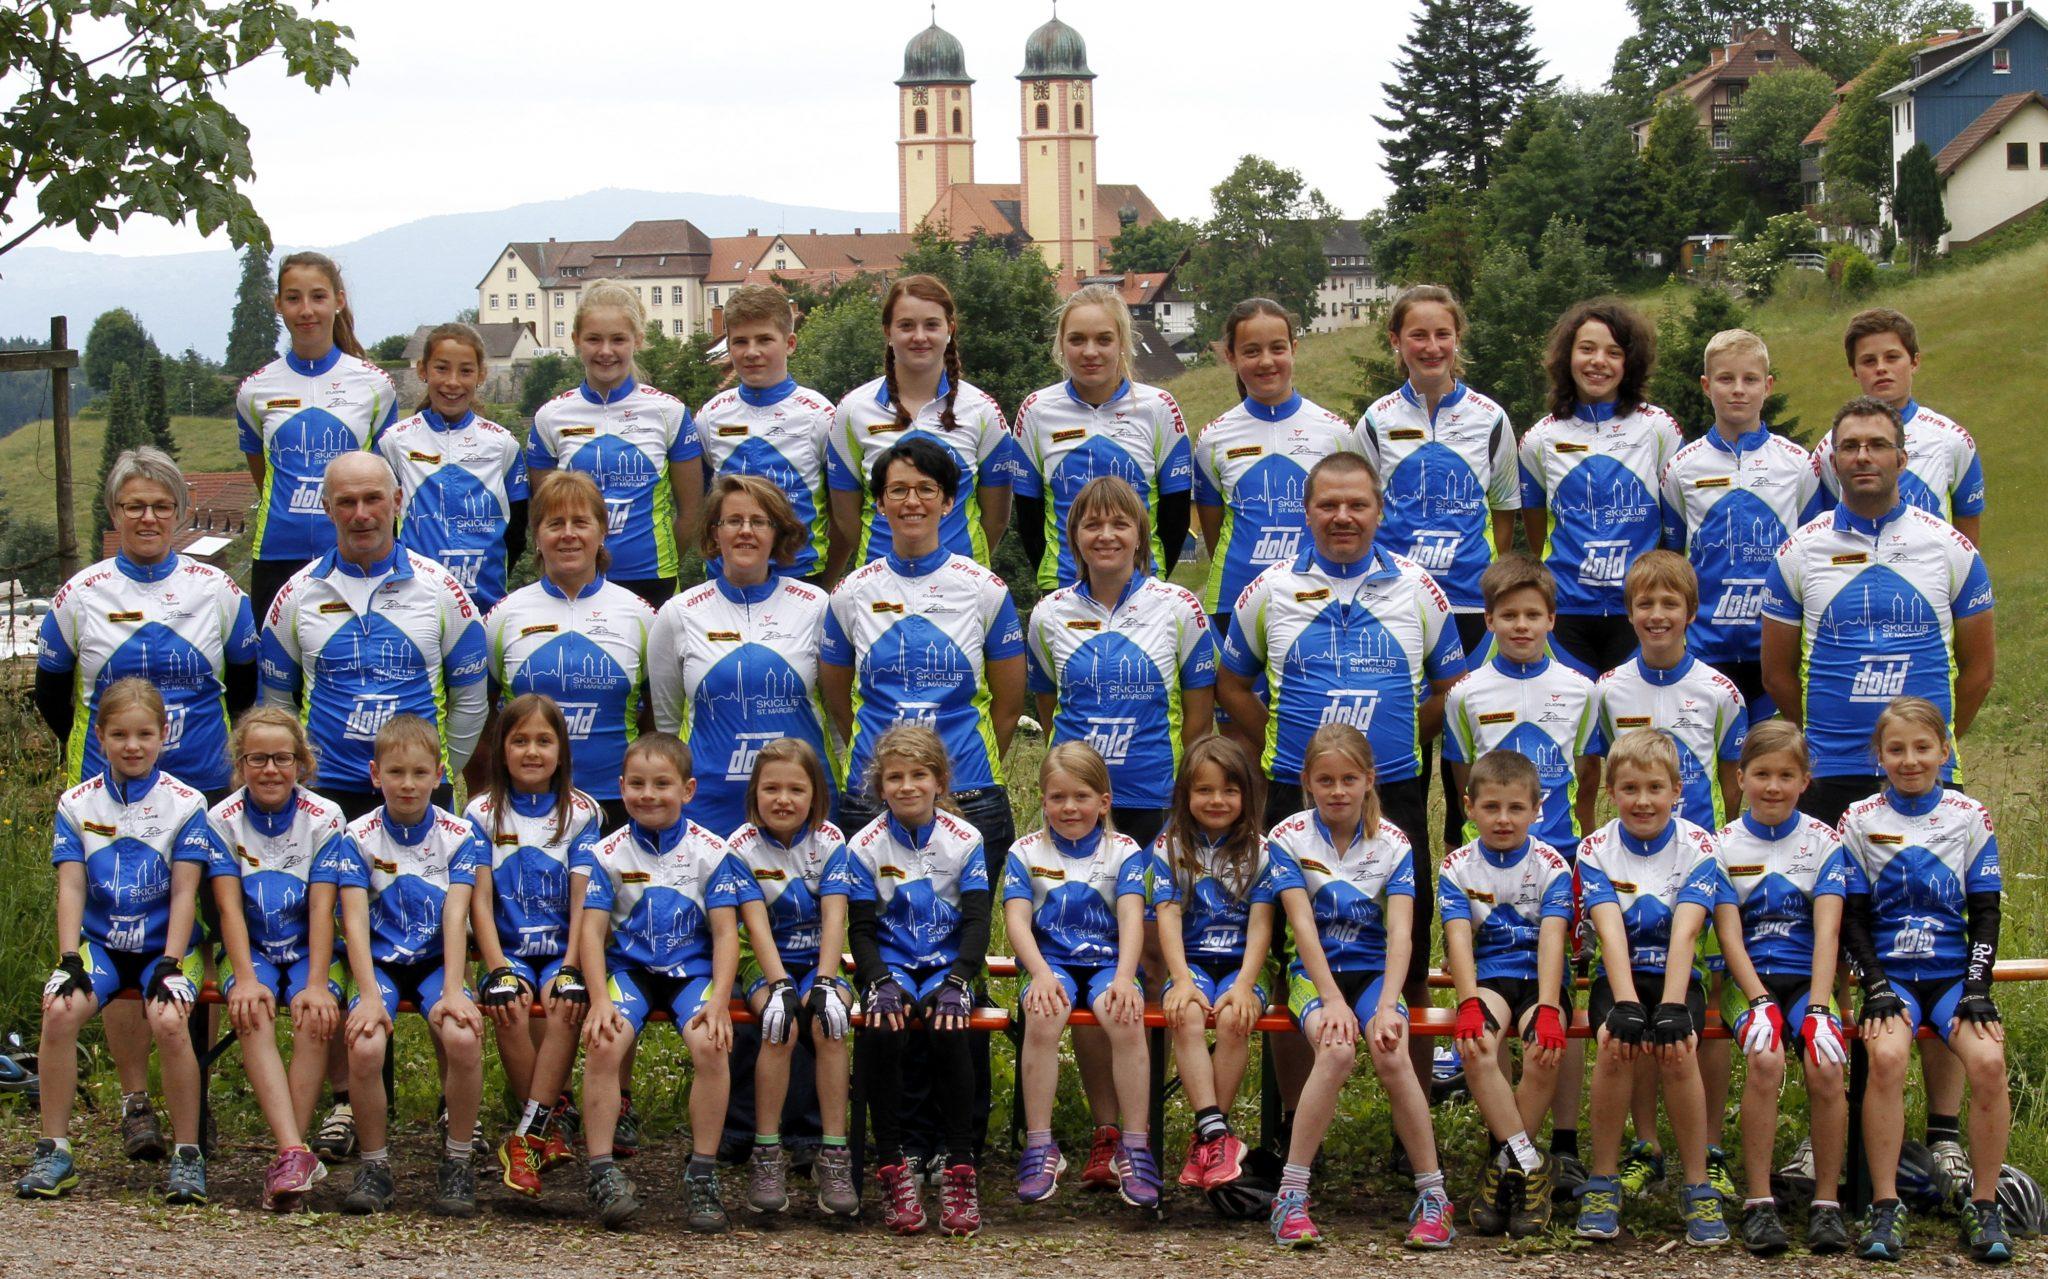 Team SkiClub St. Märgen TeamFoto 2015